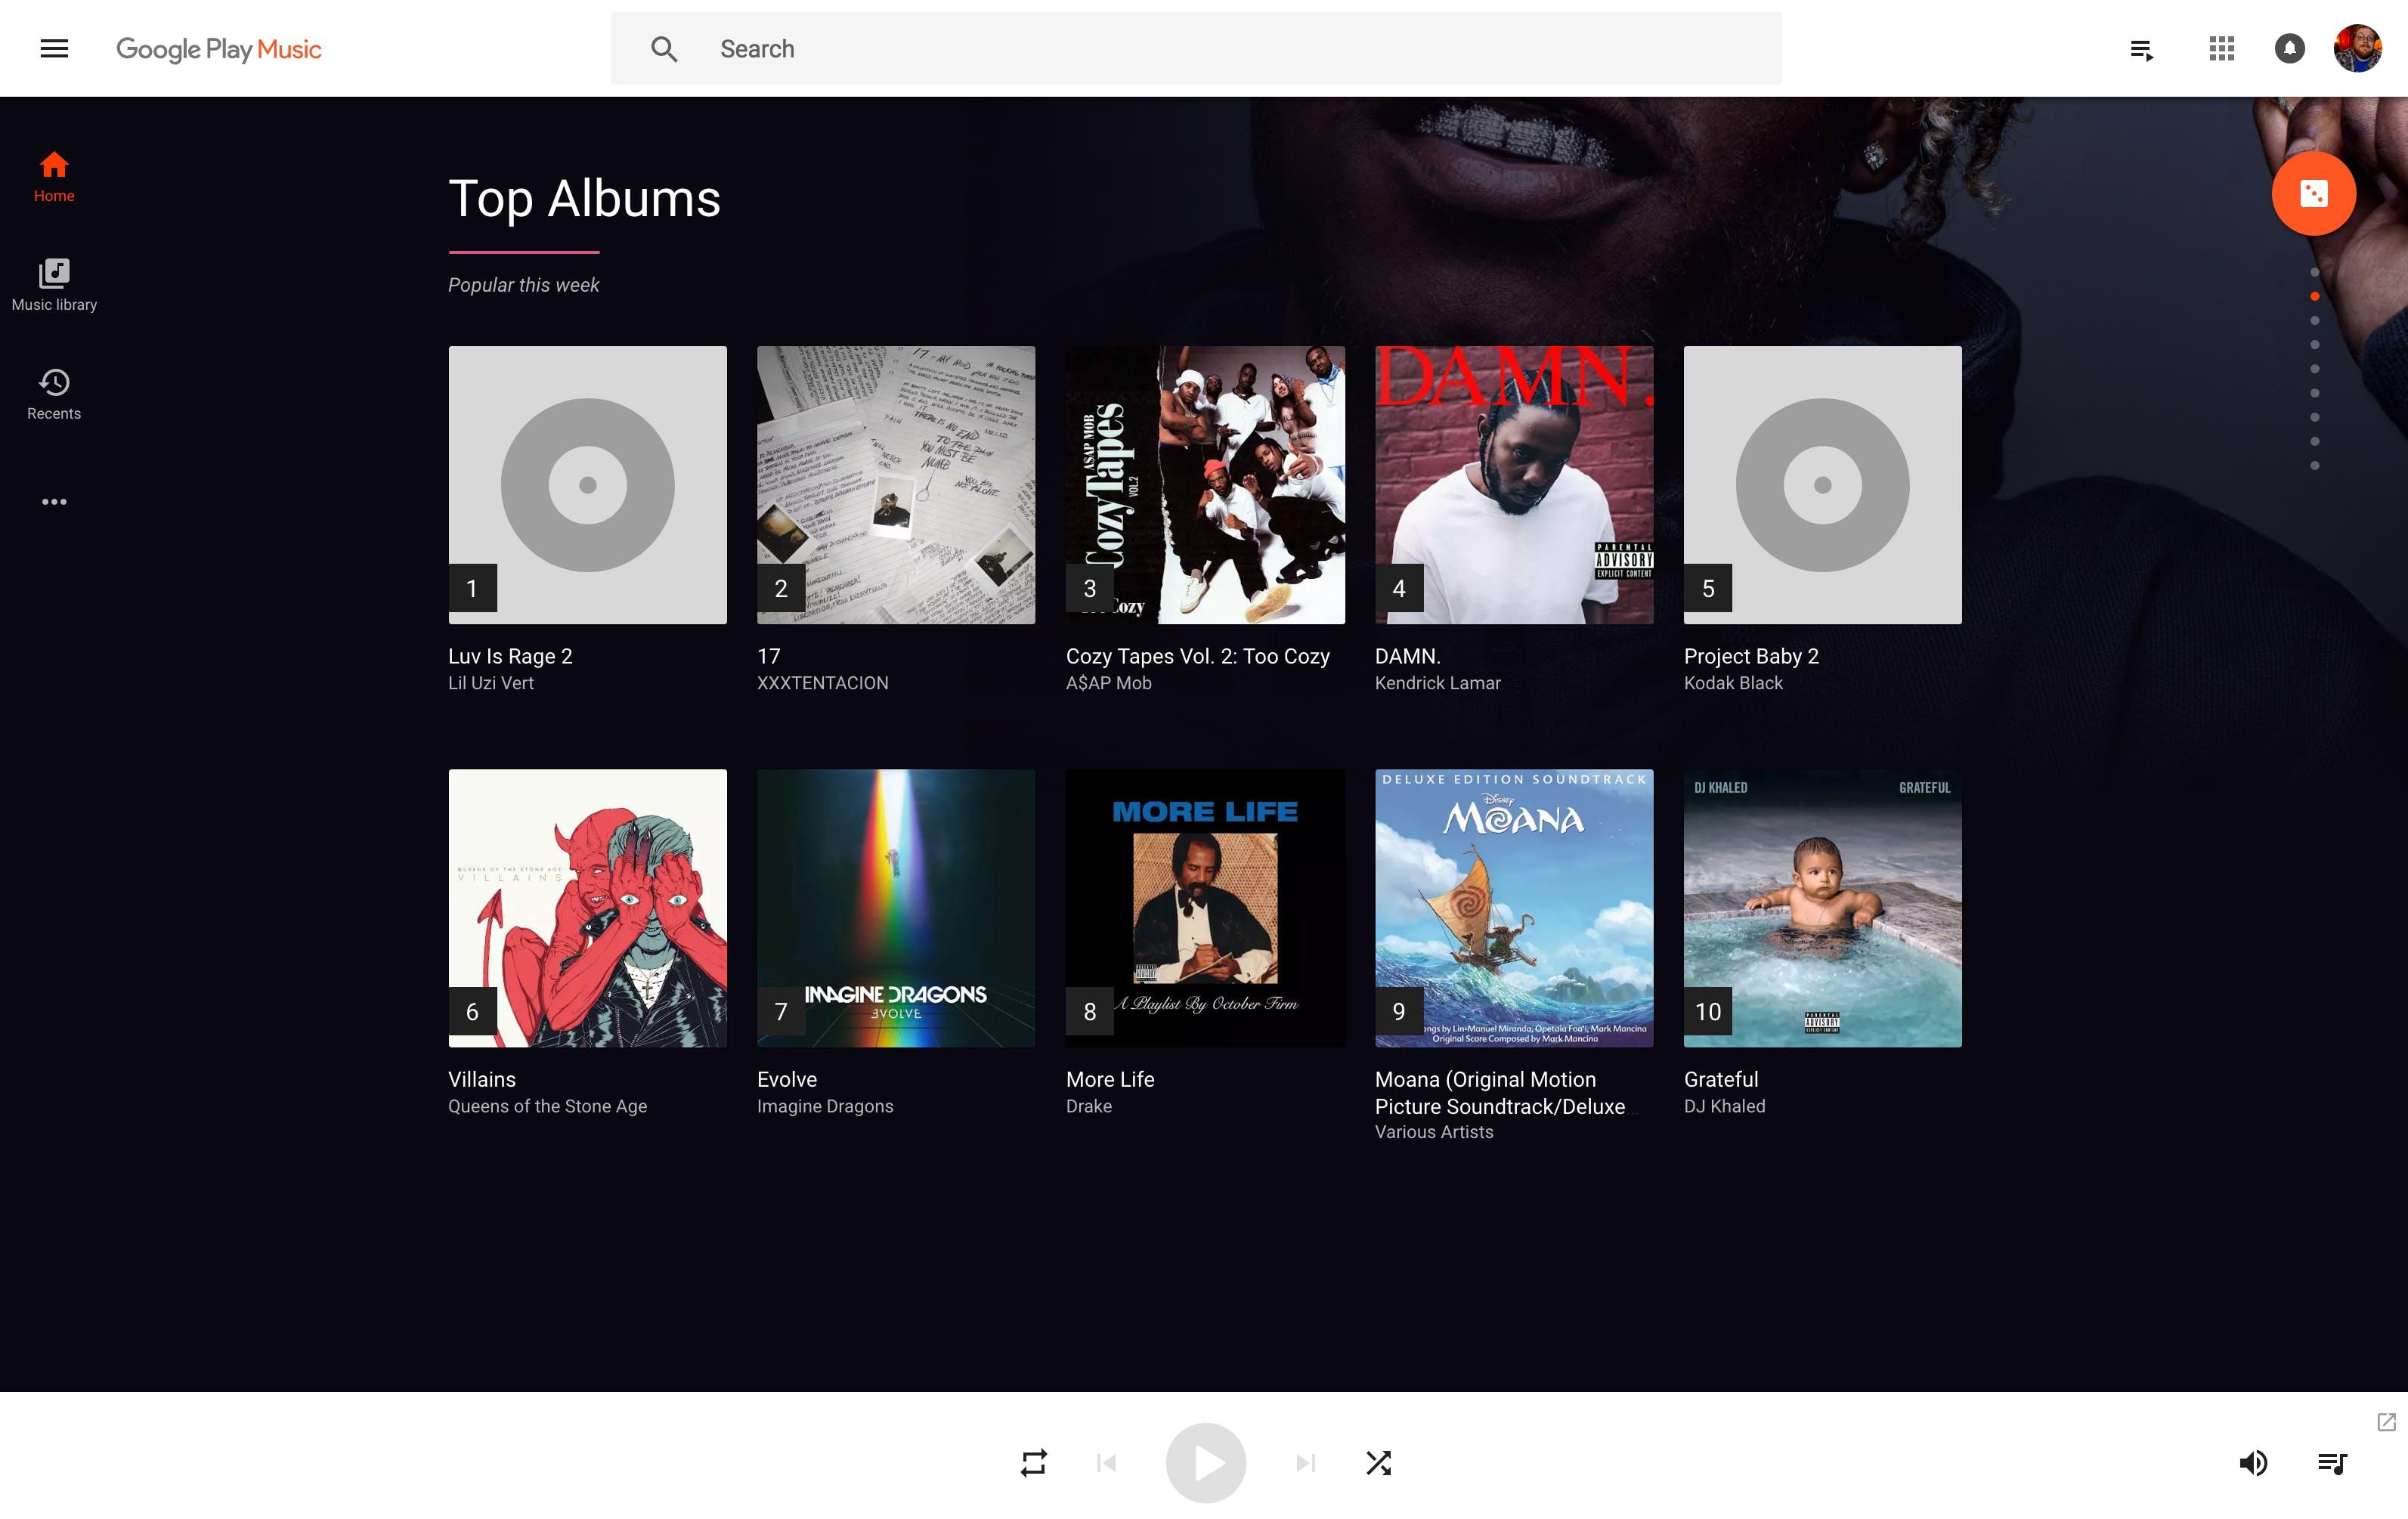 music streaming : Spotify vs Google Play Music